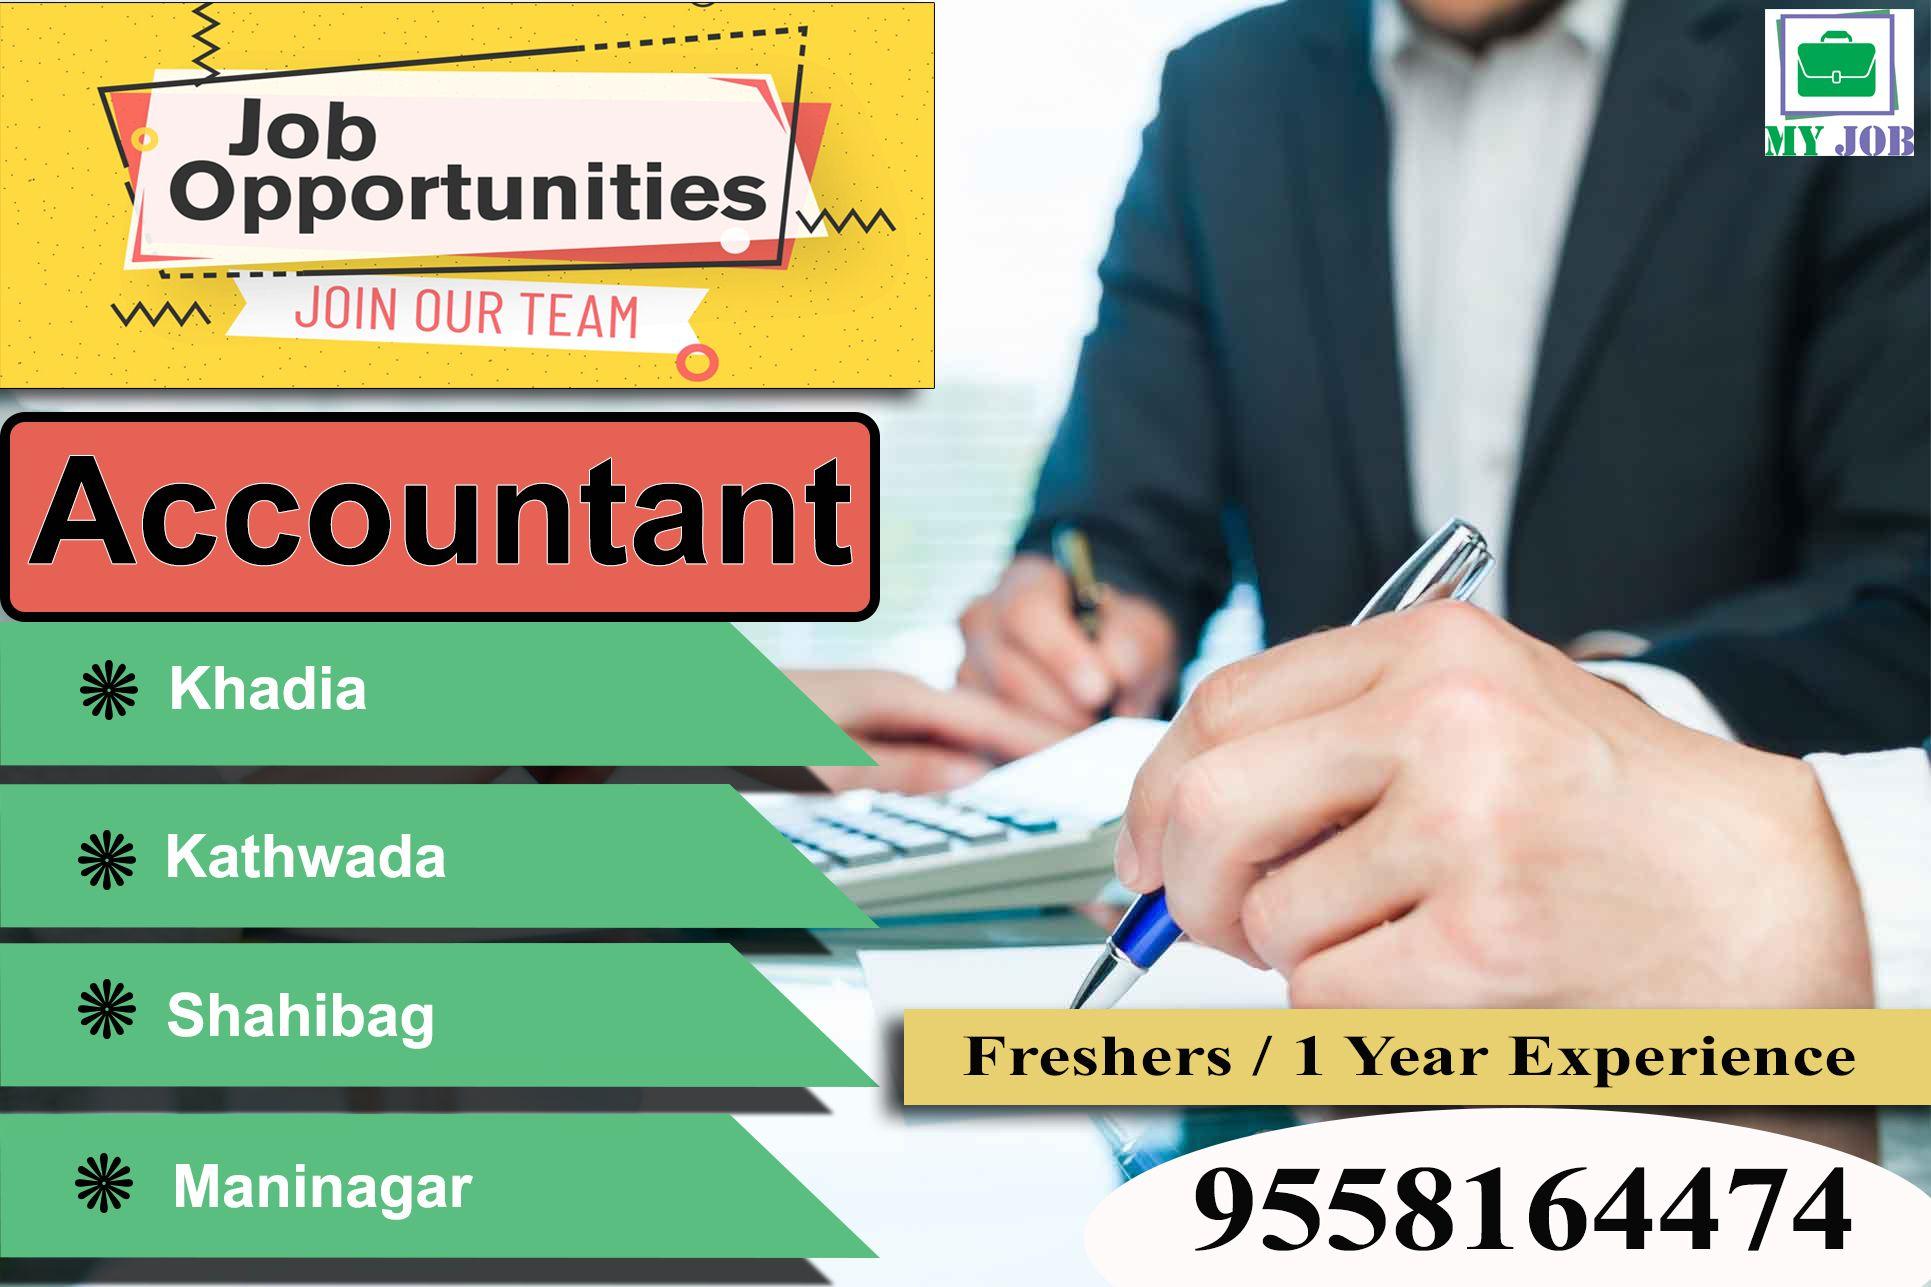 Job Vacancy For Account In Ahmedabad Fresher Can Apply Job Location Maninagar Khokhra Khadia Khatraj Kadhwada Regis Job Placement Apply Job Job